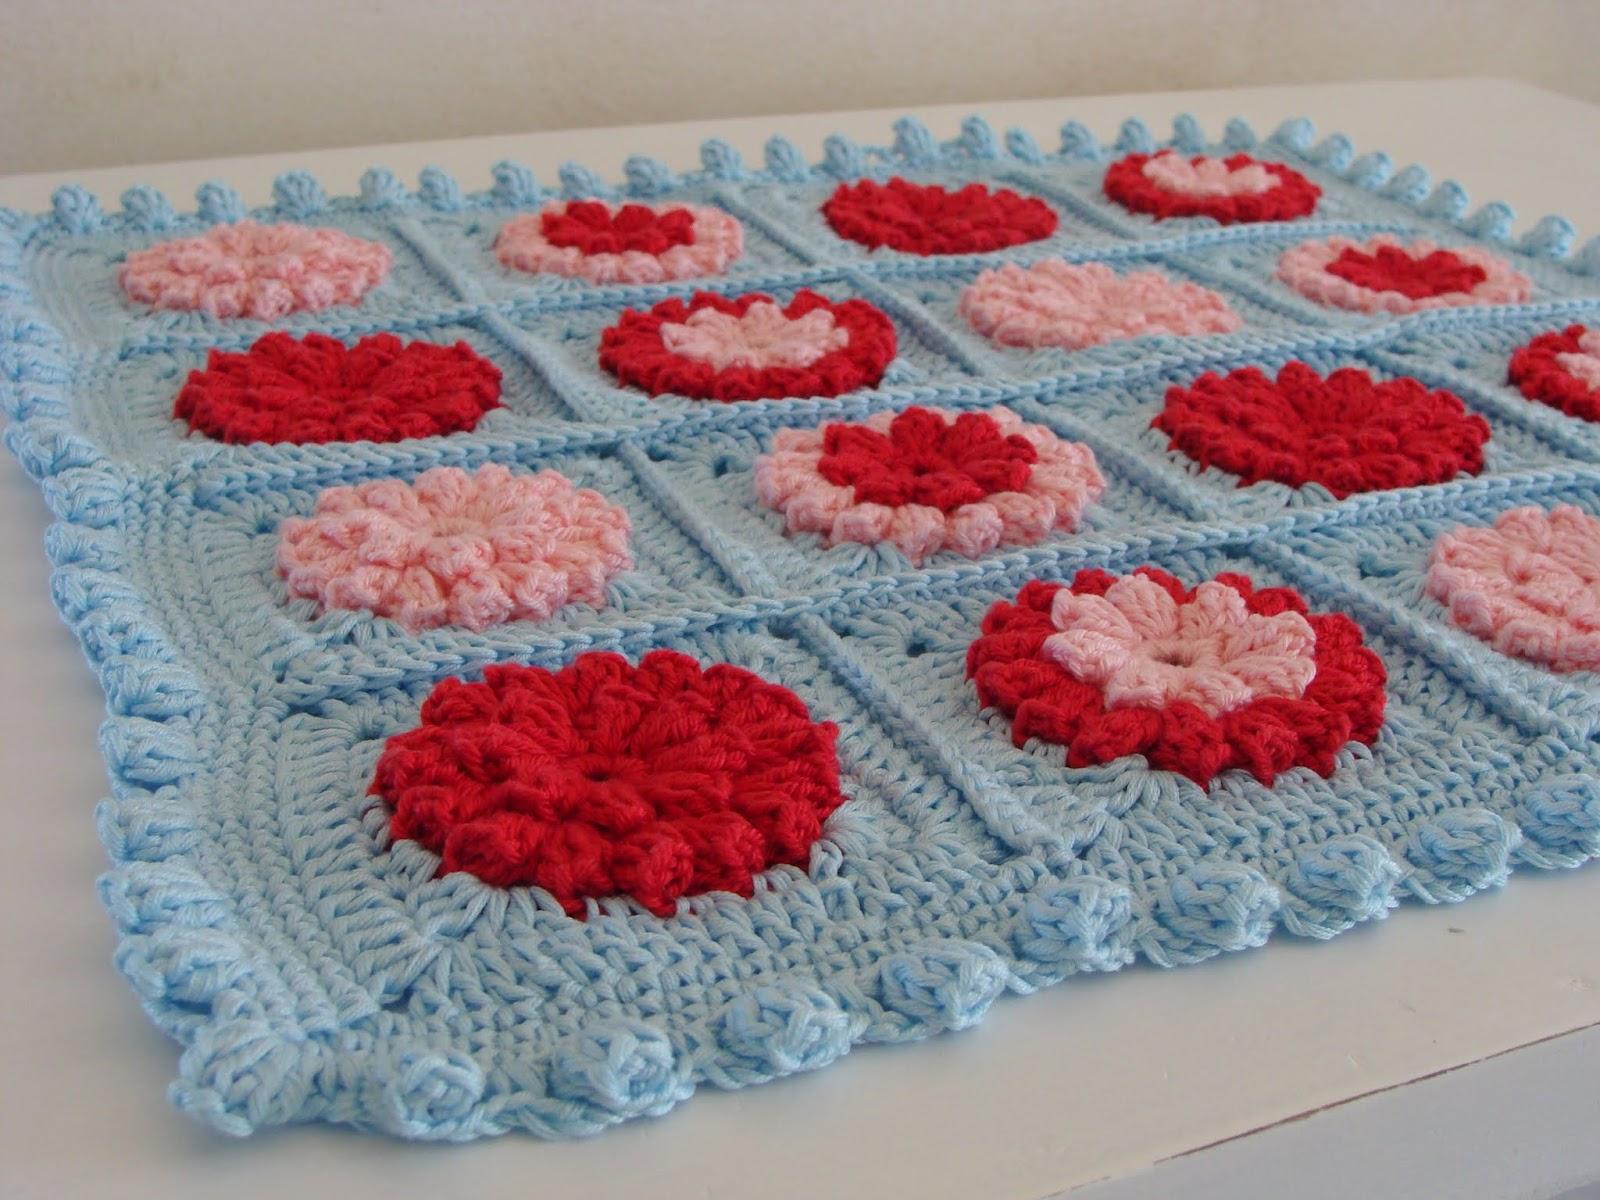 Crochet Popcorn Stitch Tutorial : Twolittlebirds: Popcorn stitch crochet edging tutorial